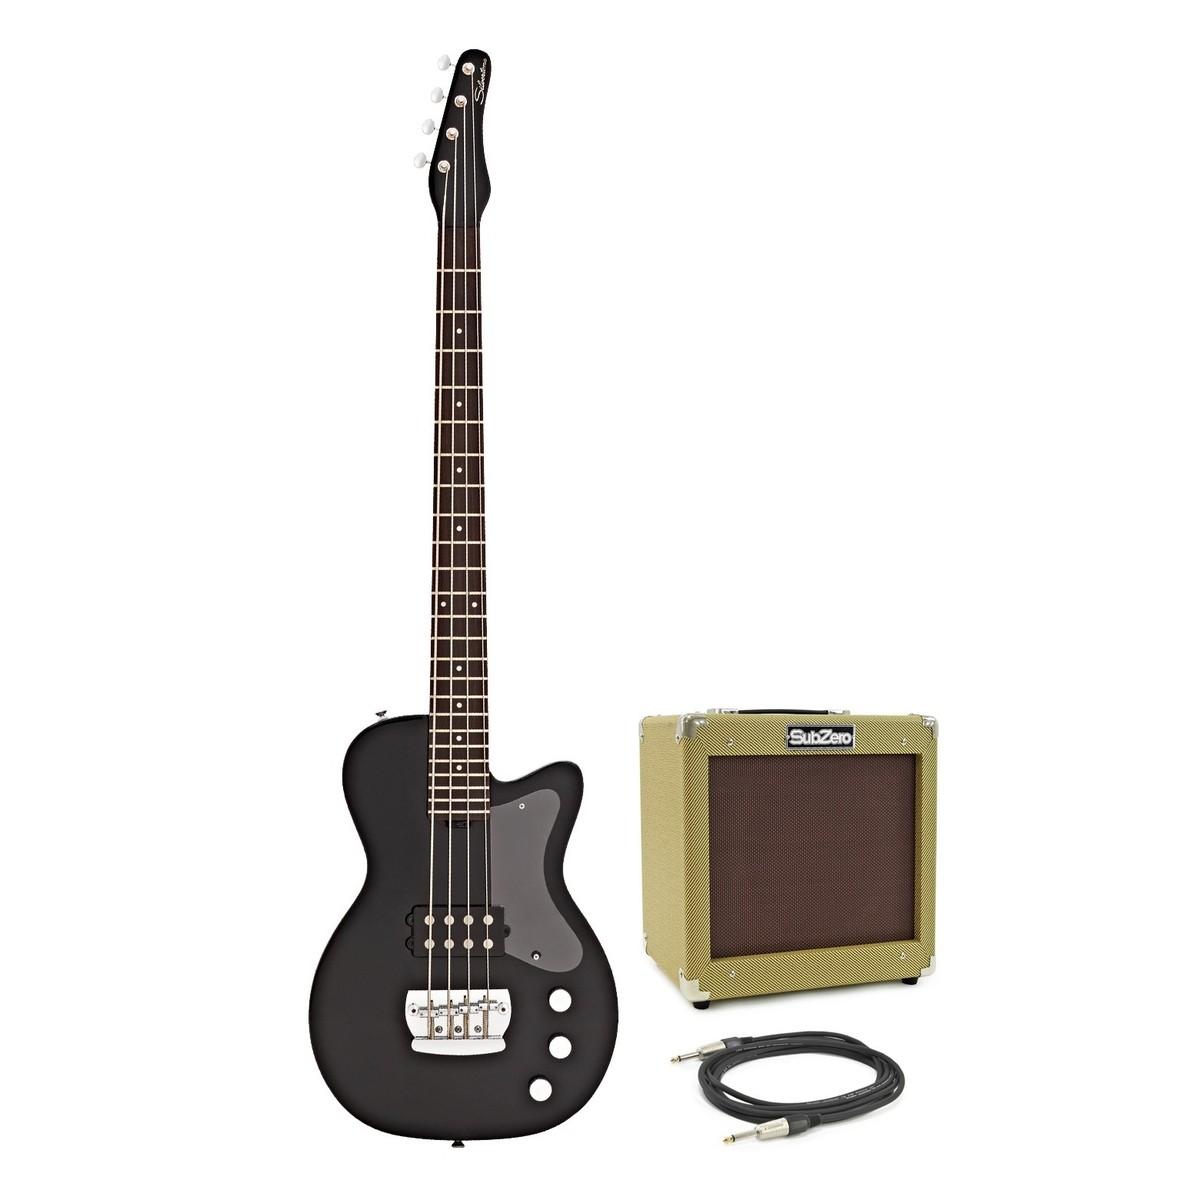 silvertone 1444 razr bass guitar with v35b amp black at gear4music. Black Bedroom Furniture Sets. Home Design Ideas